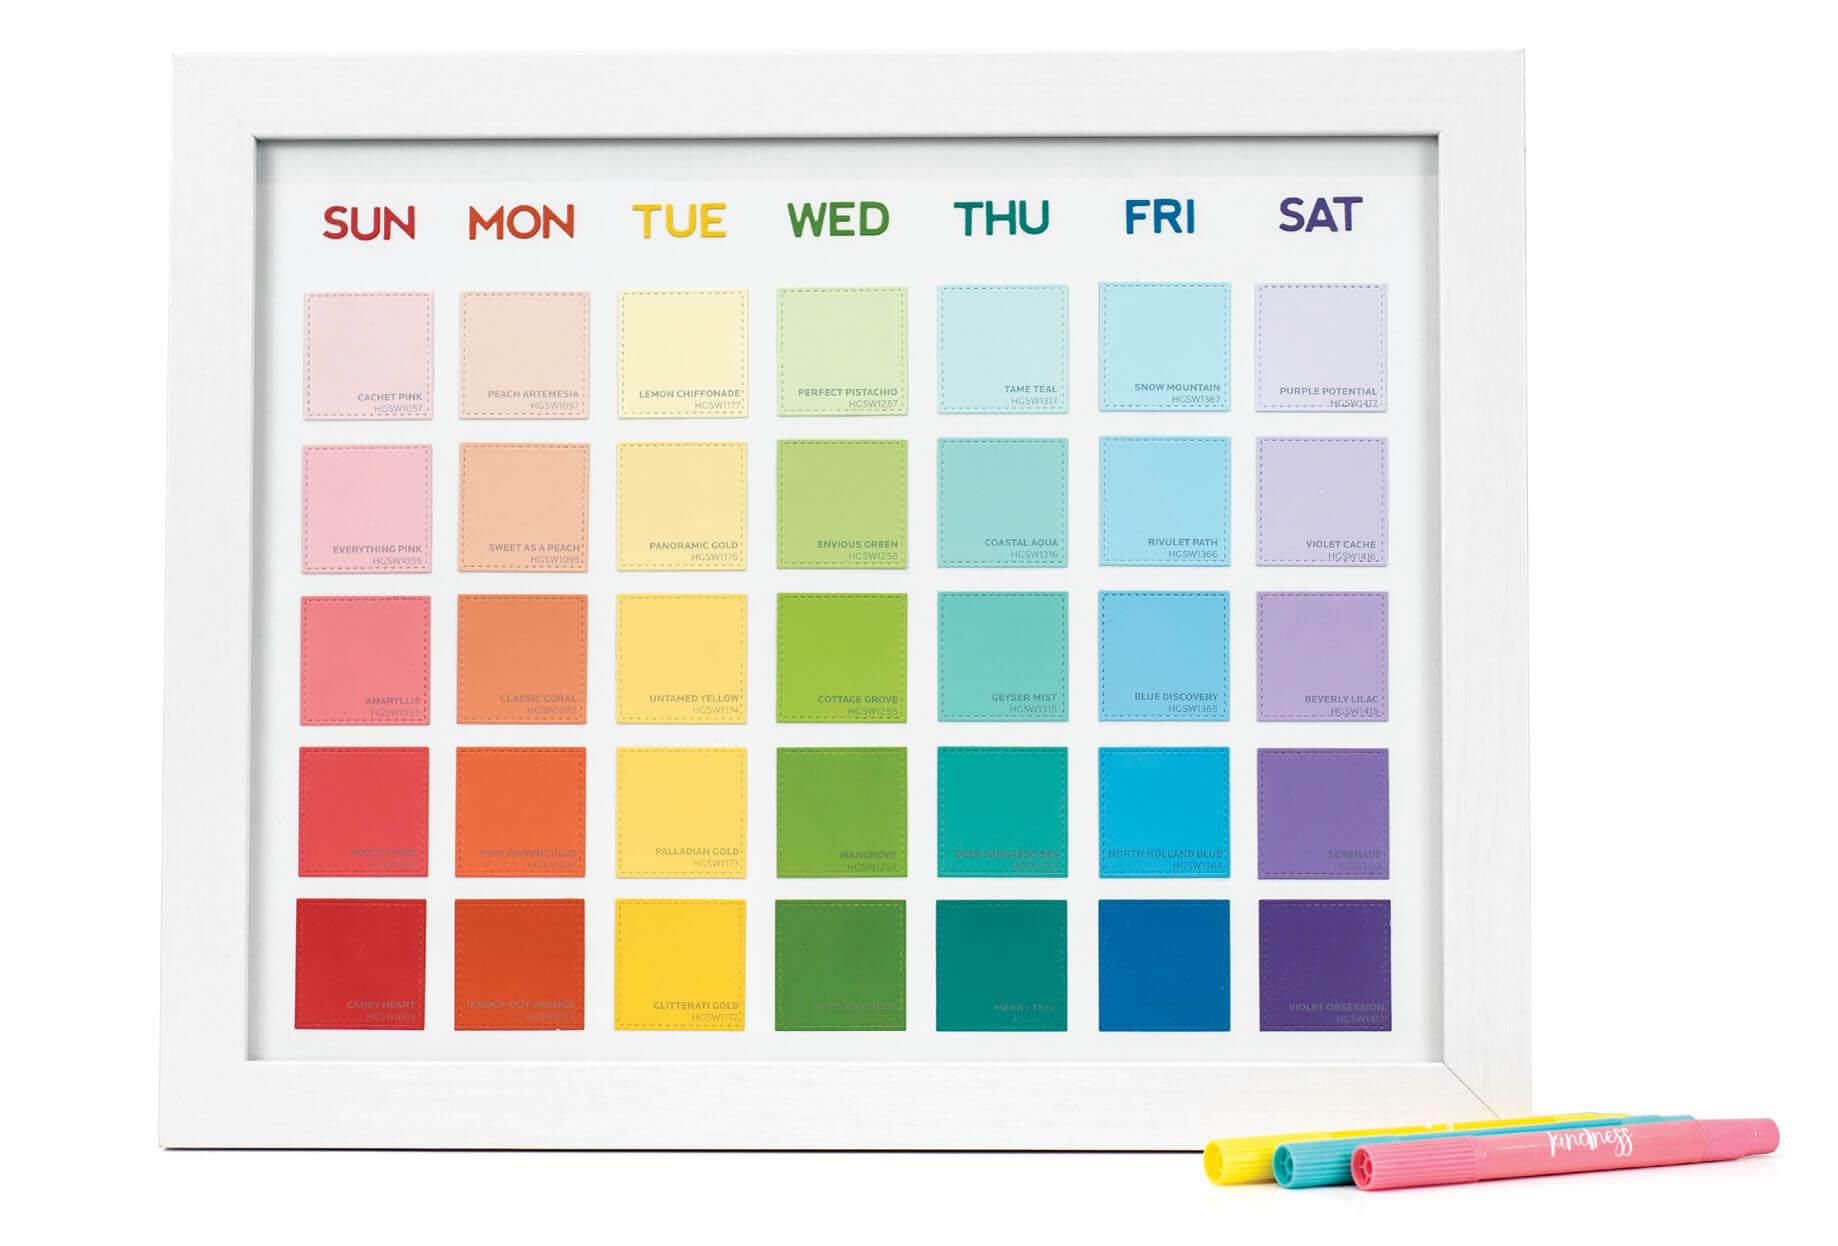 Scrapbook & Cards Today - Summer 2019 - Paint Swatch Rainbow Calendar by Stephanie Klauck